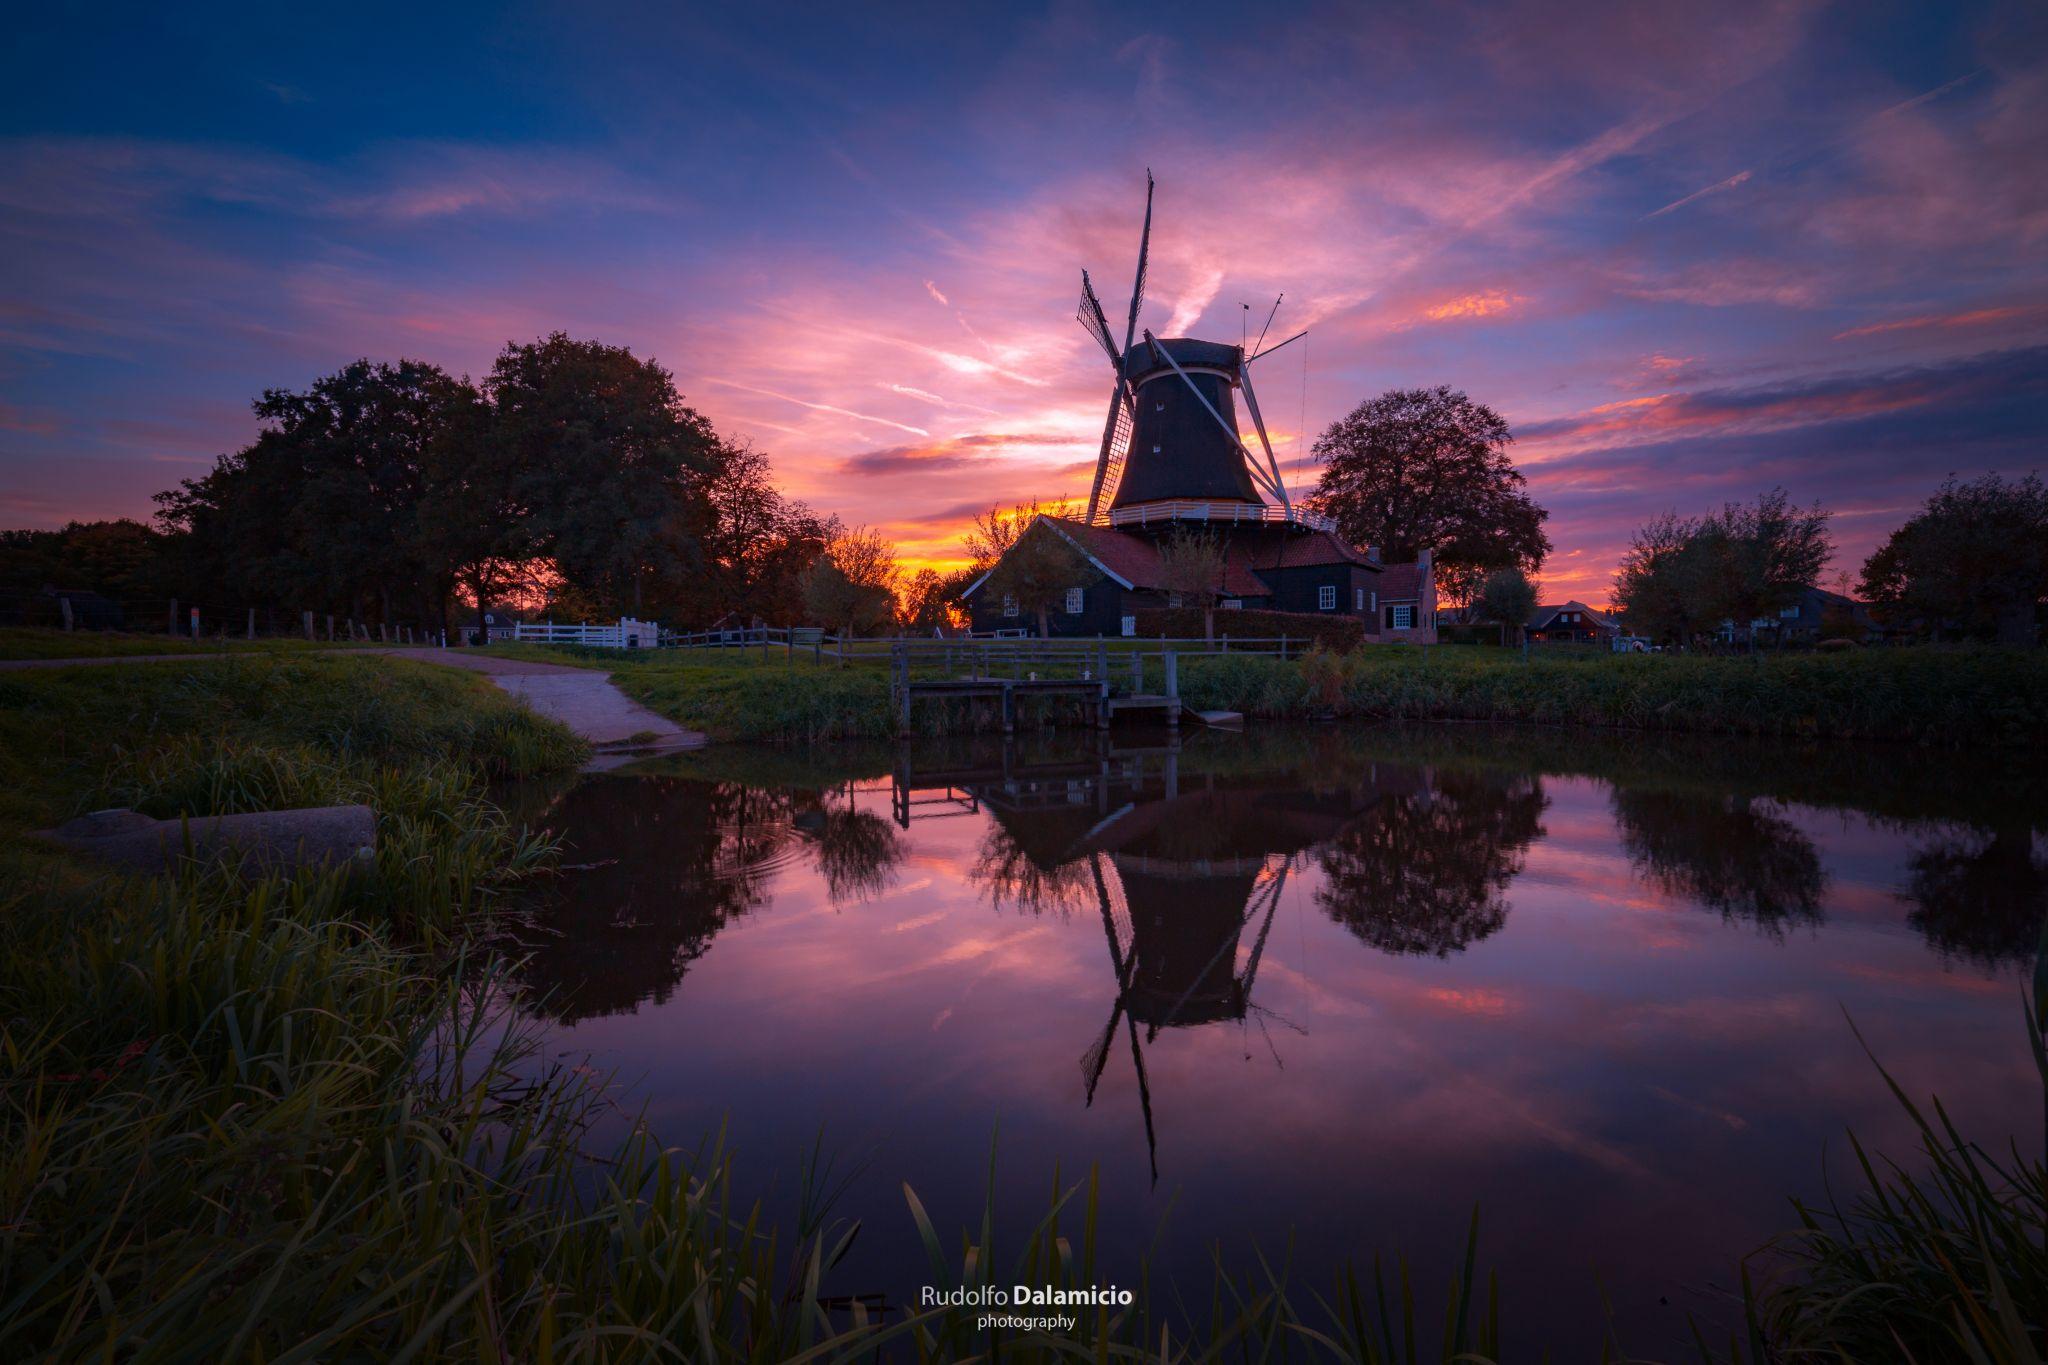 The Dutch Like Mills, Netherlands